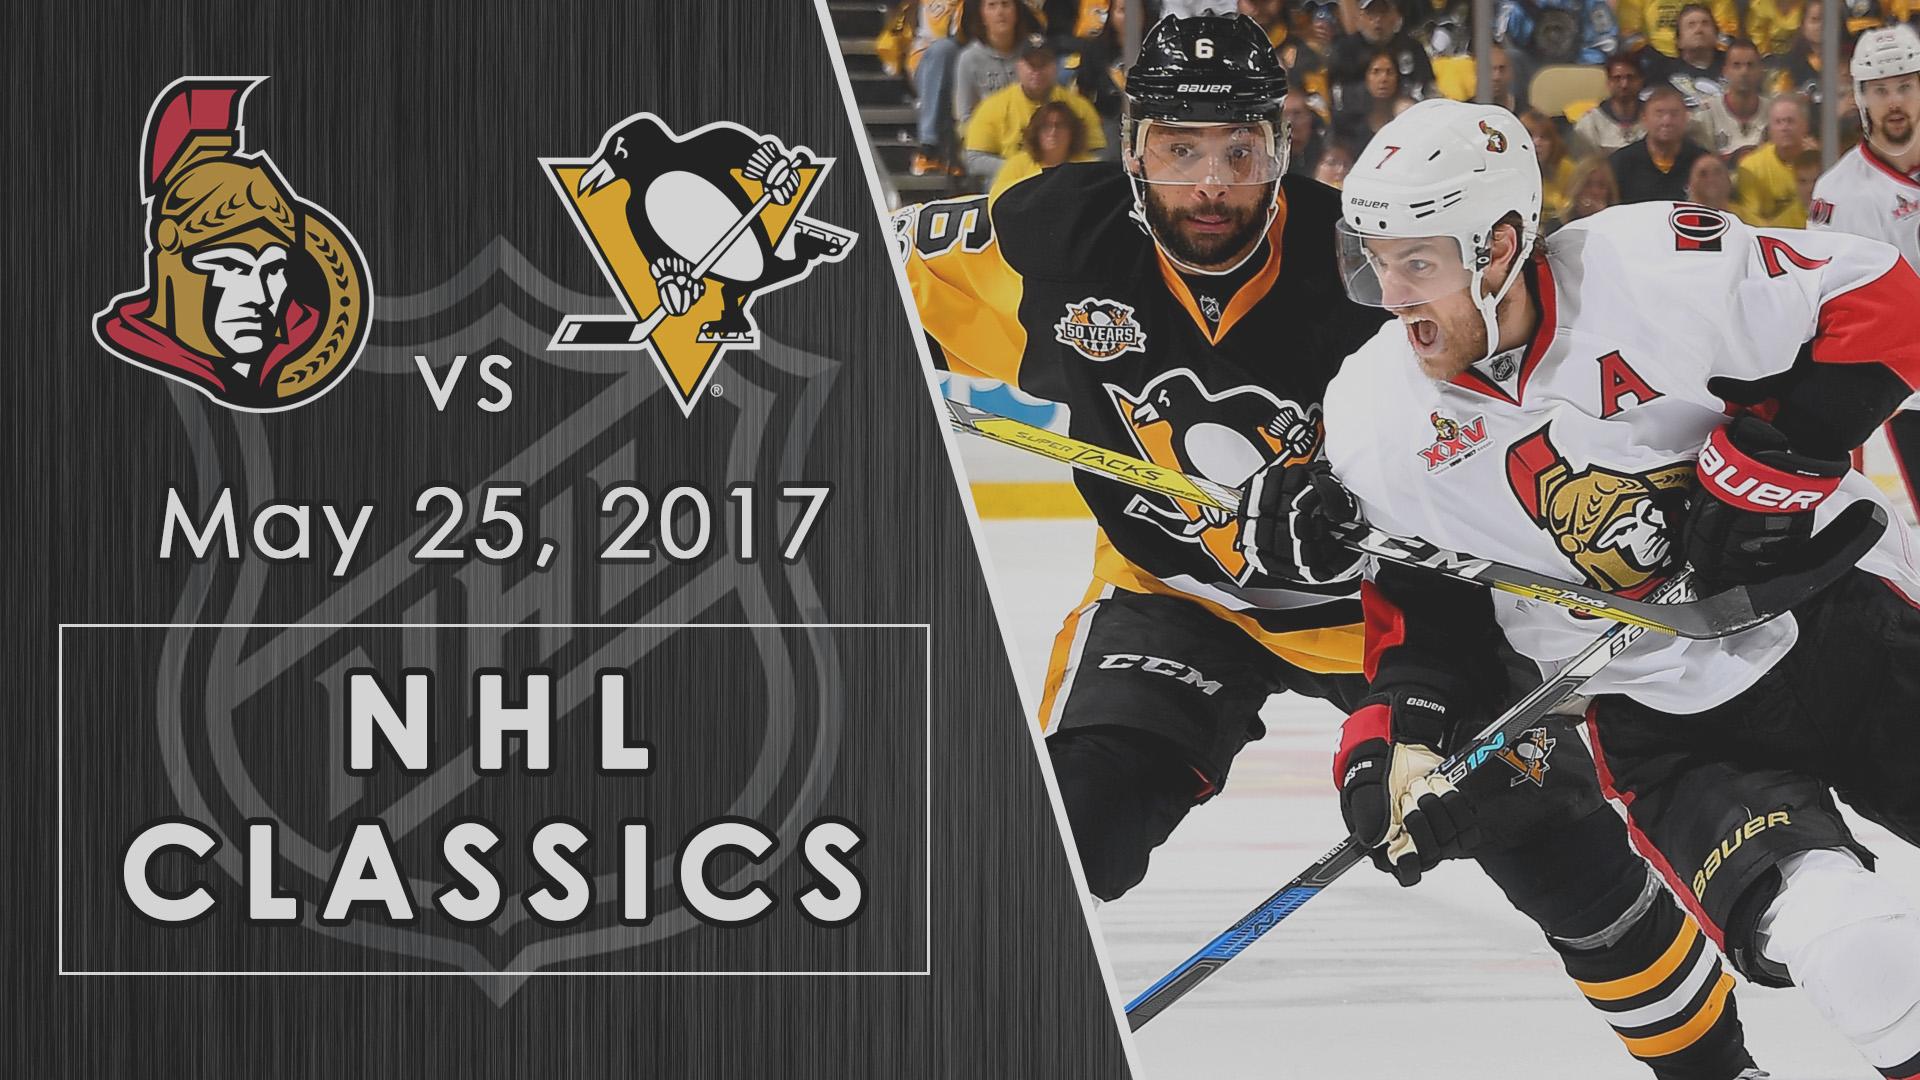 NHL Classics: Penguins take down Senators in double OT of Game 7